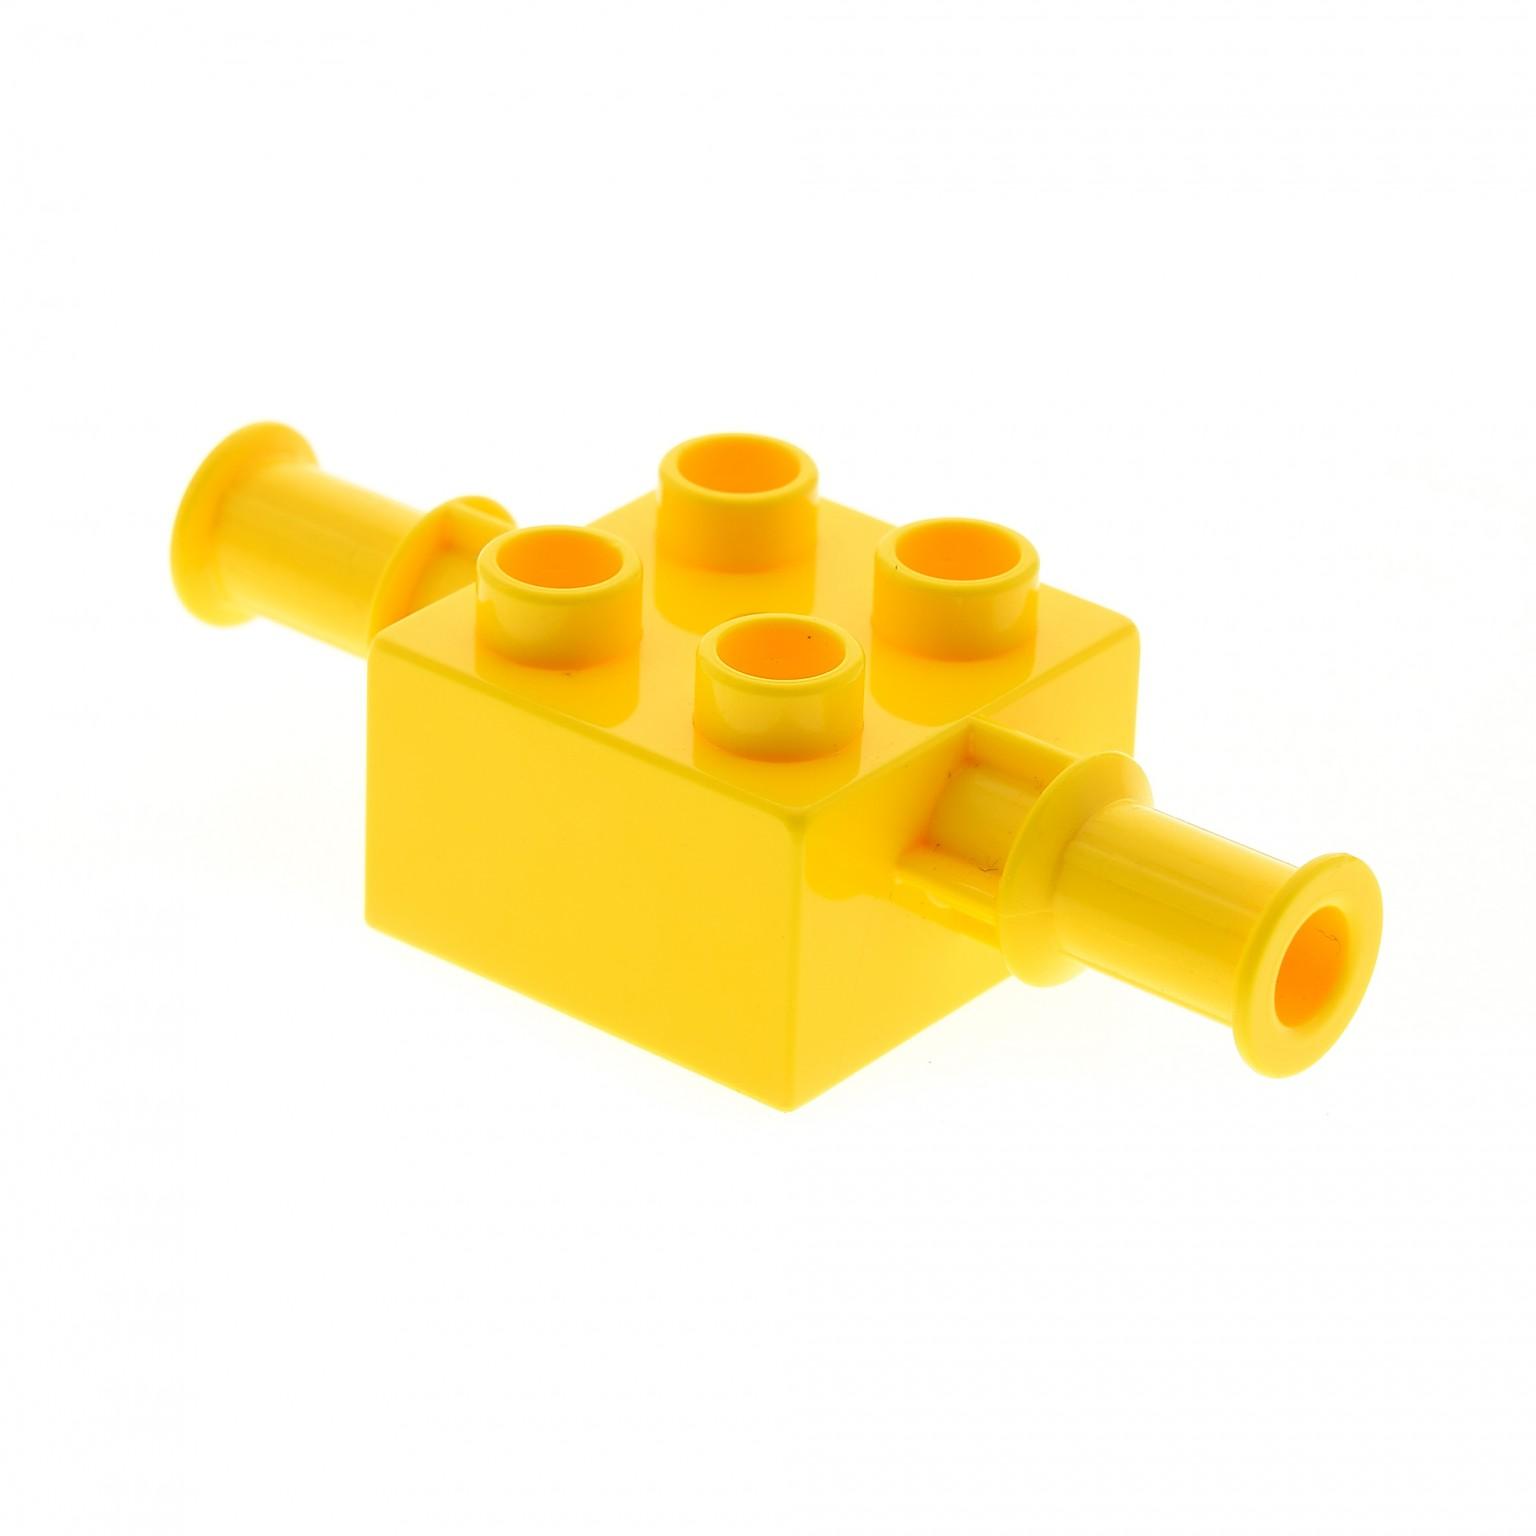 1 X Lego Brick Yellow Duplo Brick 2 X 2 With Digger Bucket Arm